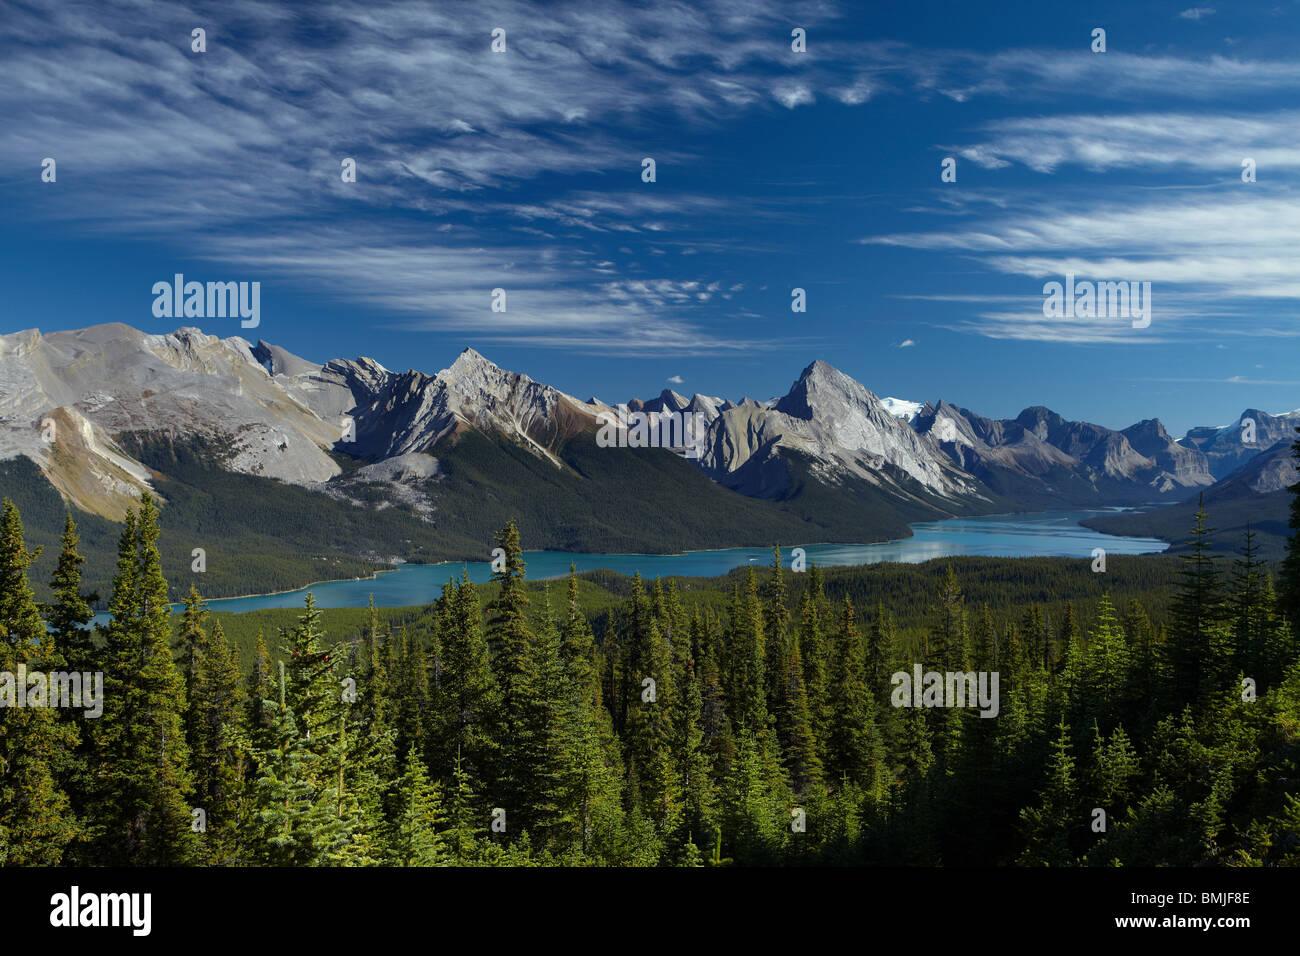 Maligne Lake from Bald Hills, Jasper National Park, Alberta, Canada - Stock Image